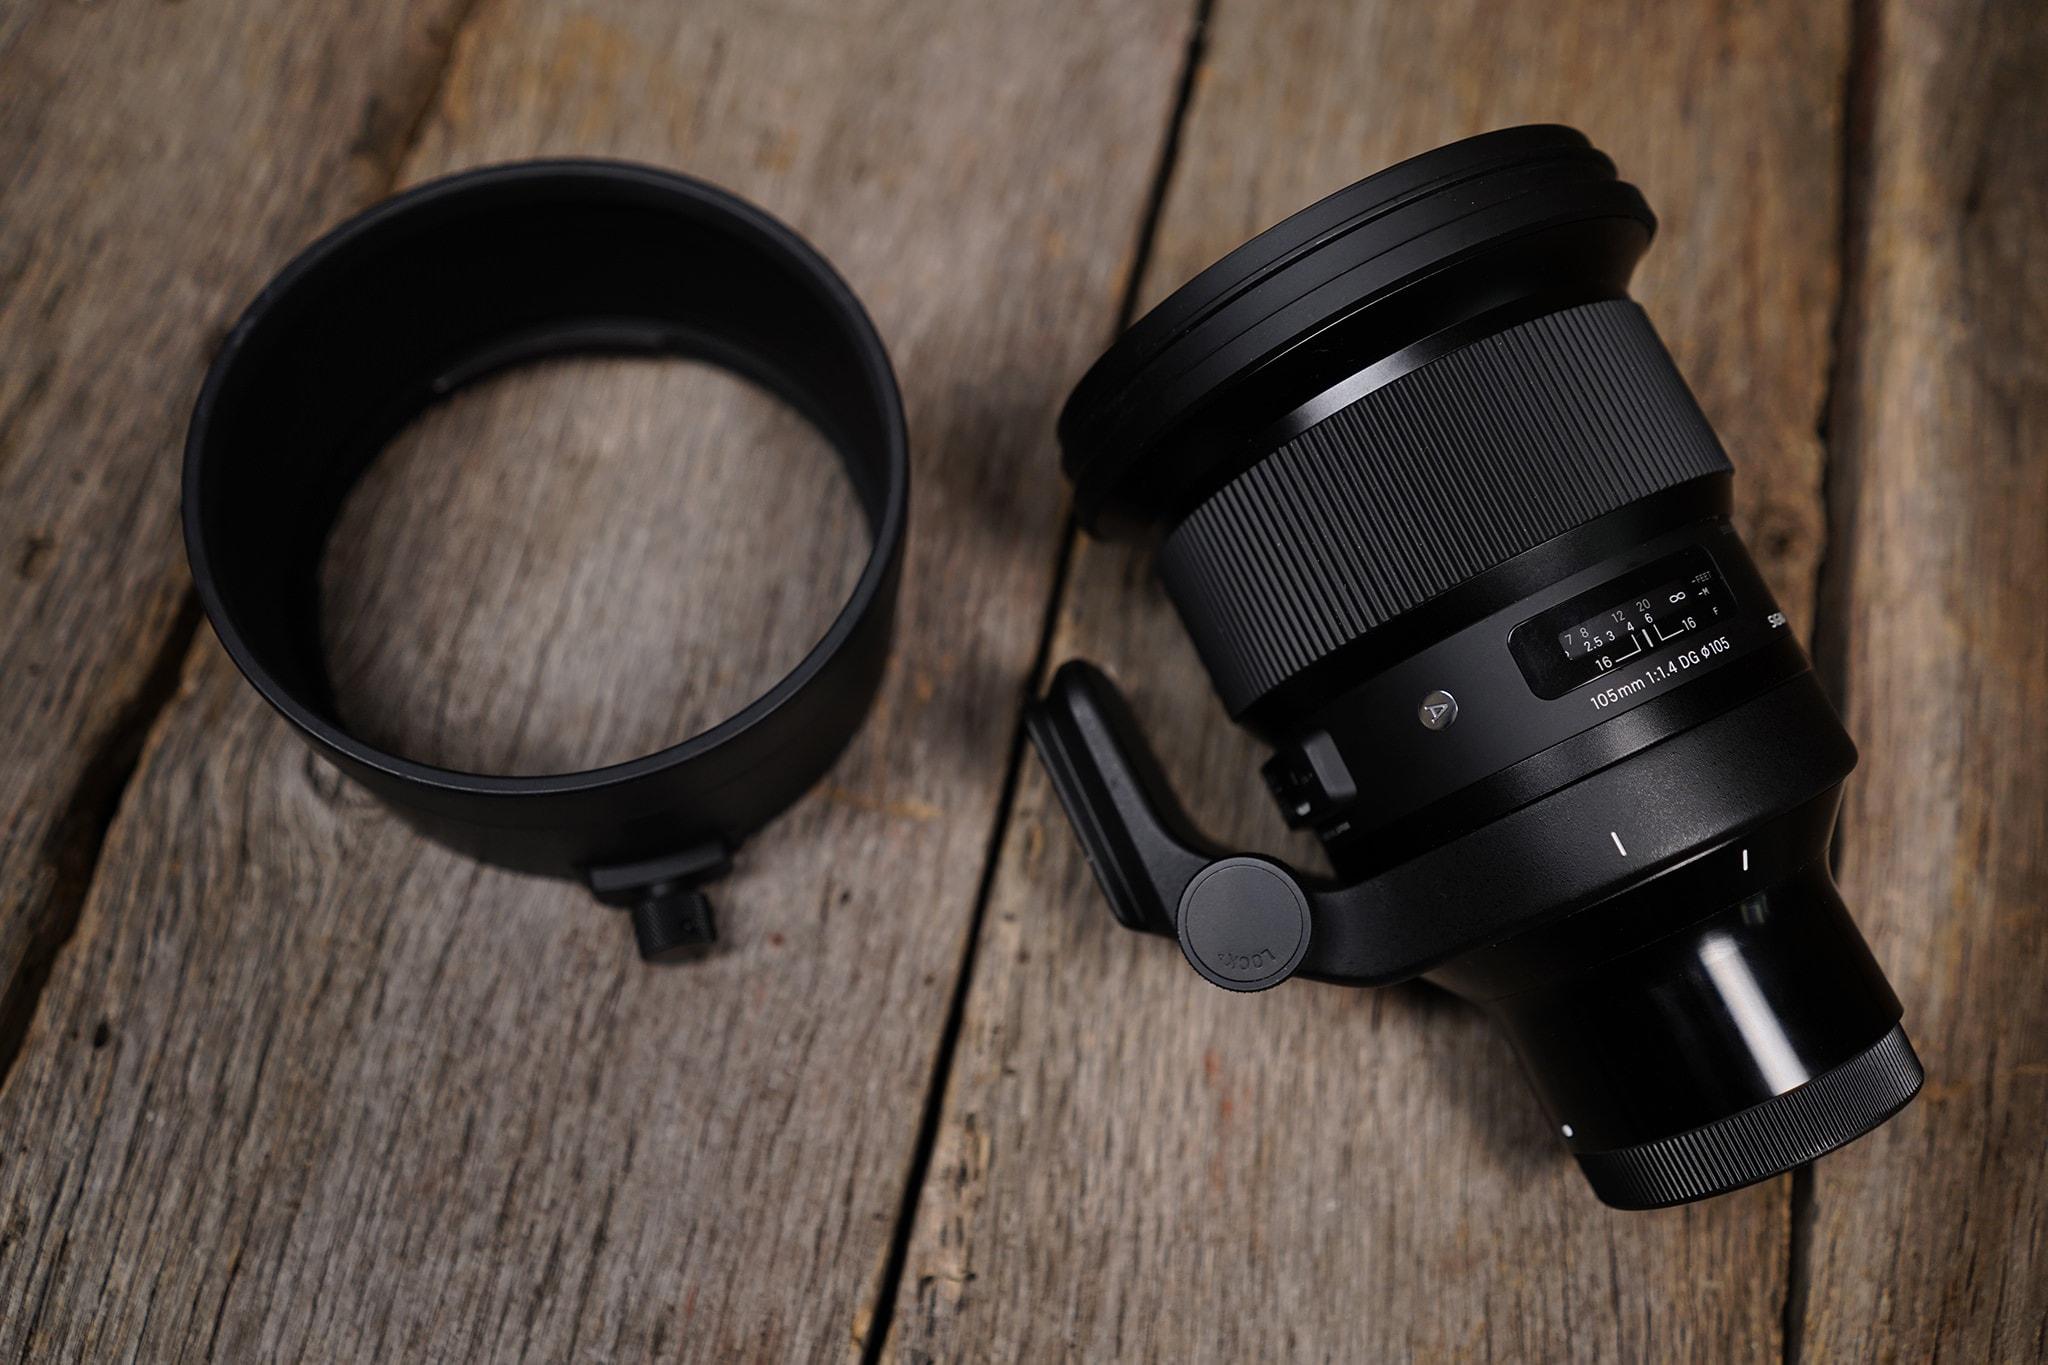 Shotkit Review Sigma 105mm f/1.4